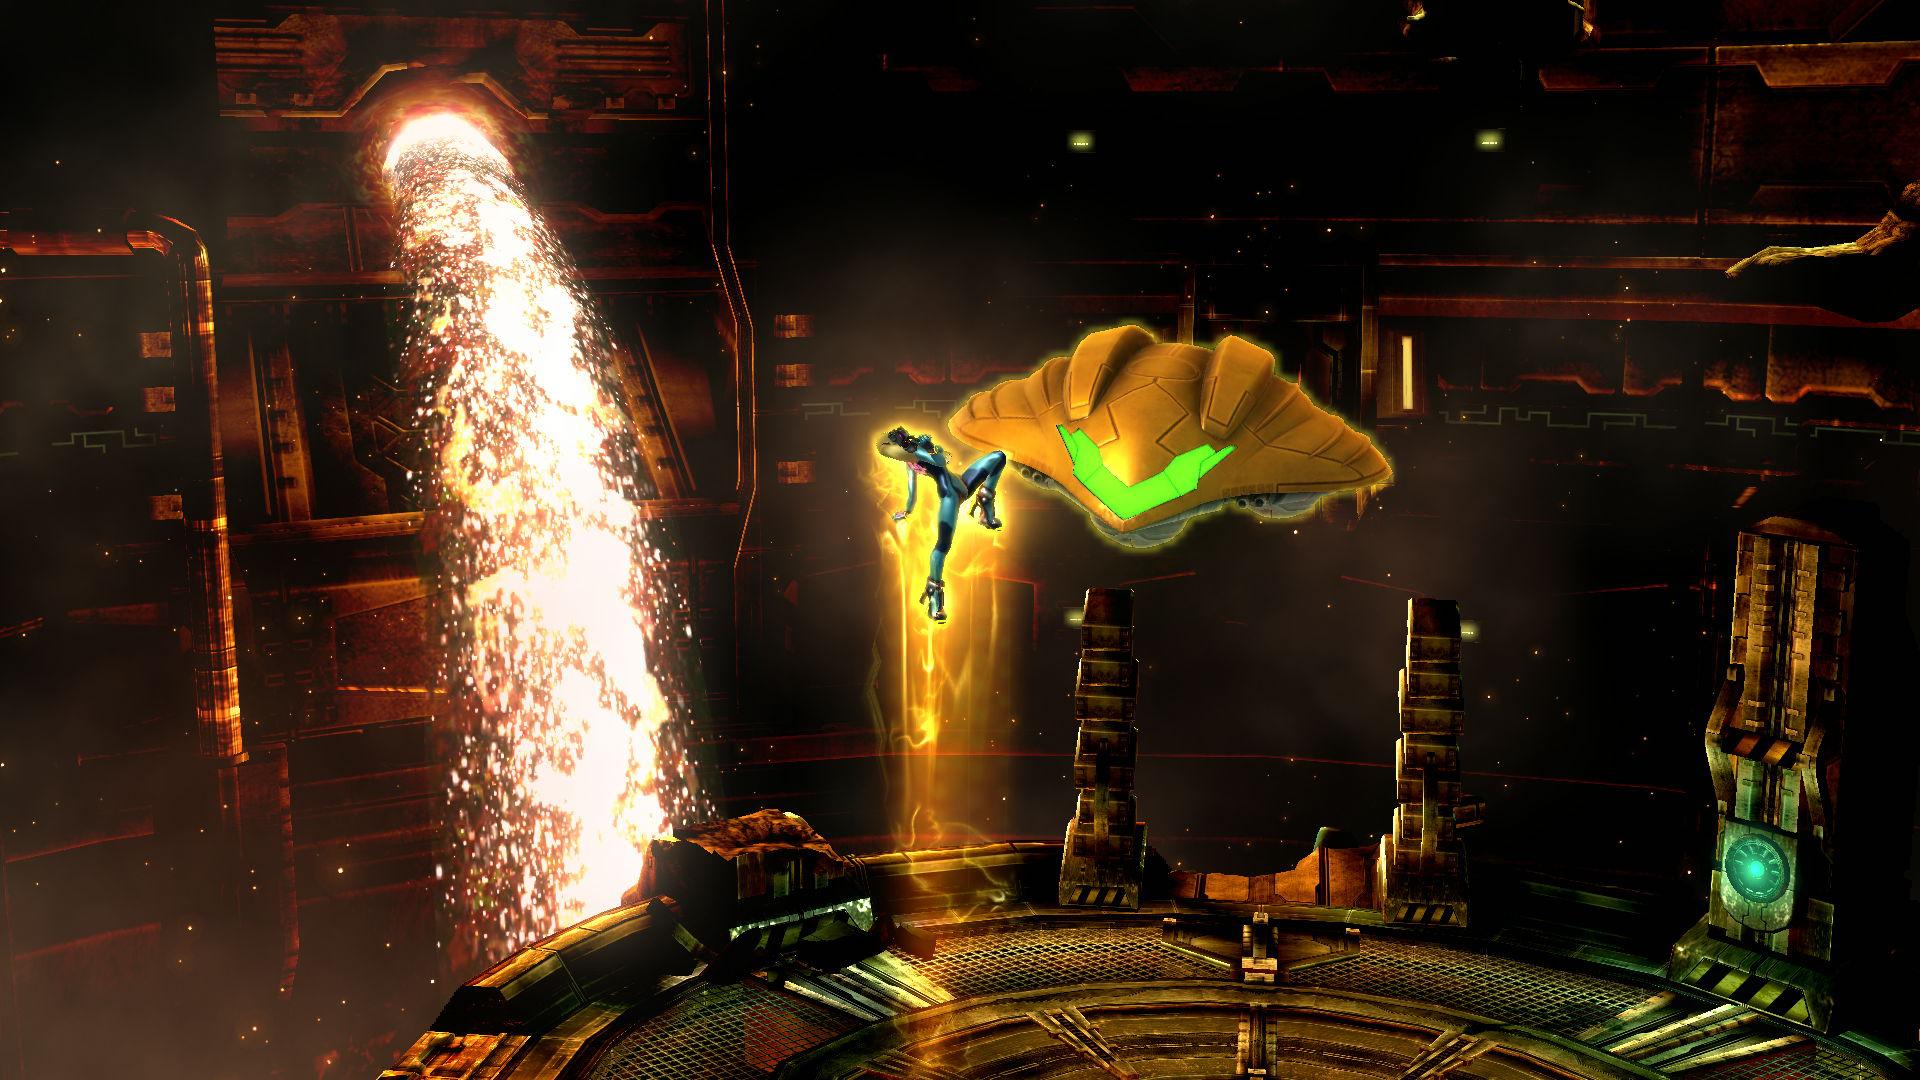 Nave de combate (Smash Final)